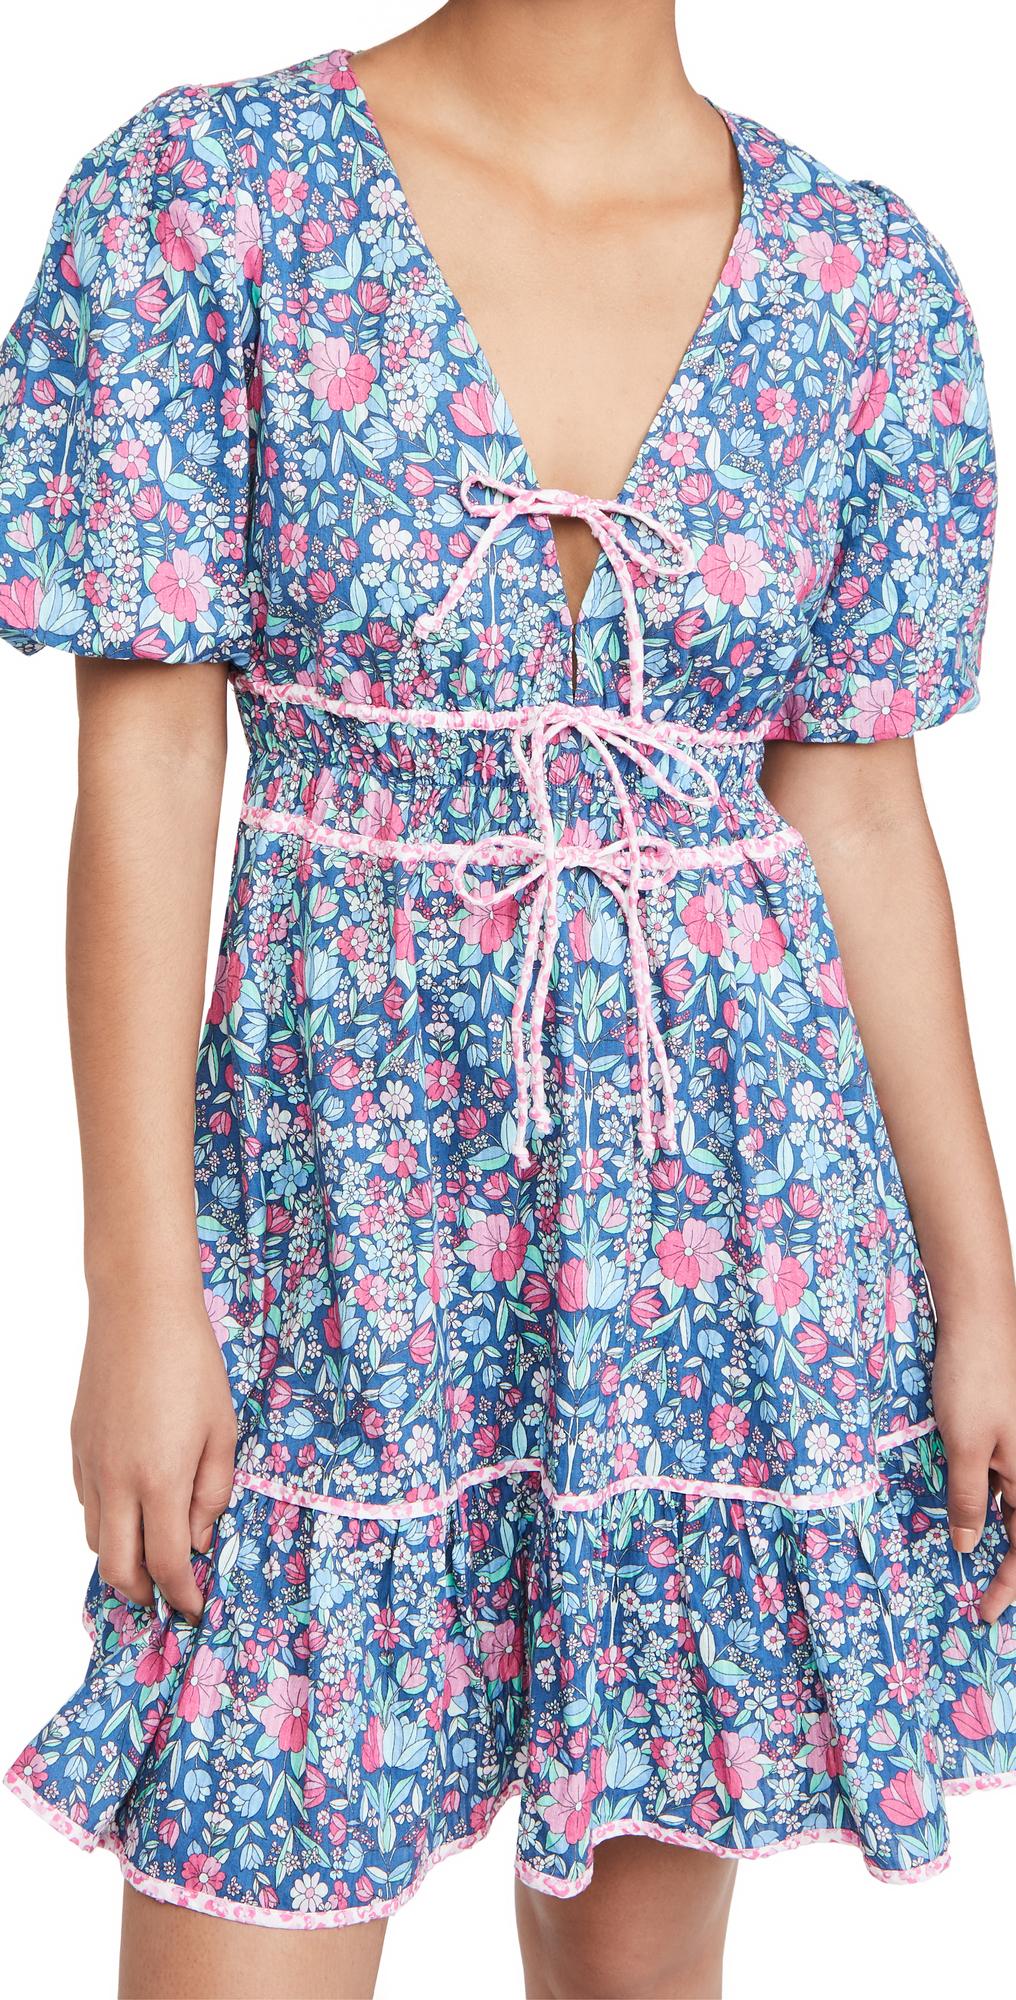 Shoshanna Tiska Dress